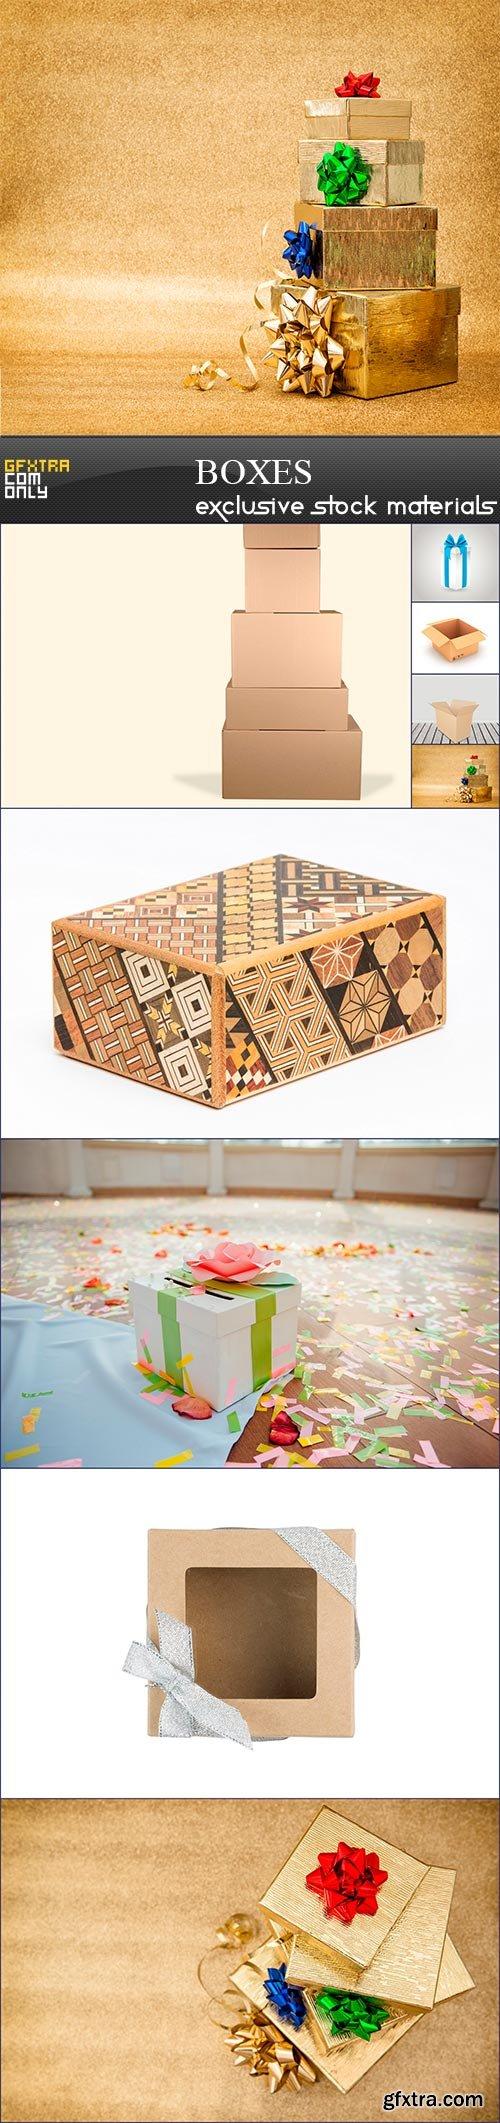 Boxes, 9 x UHQ JPEG